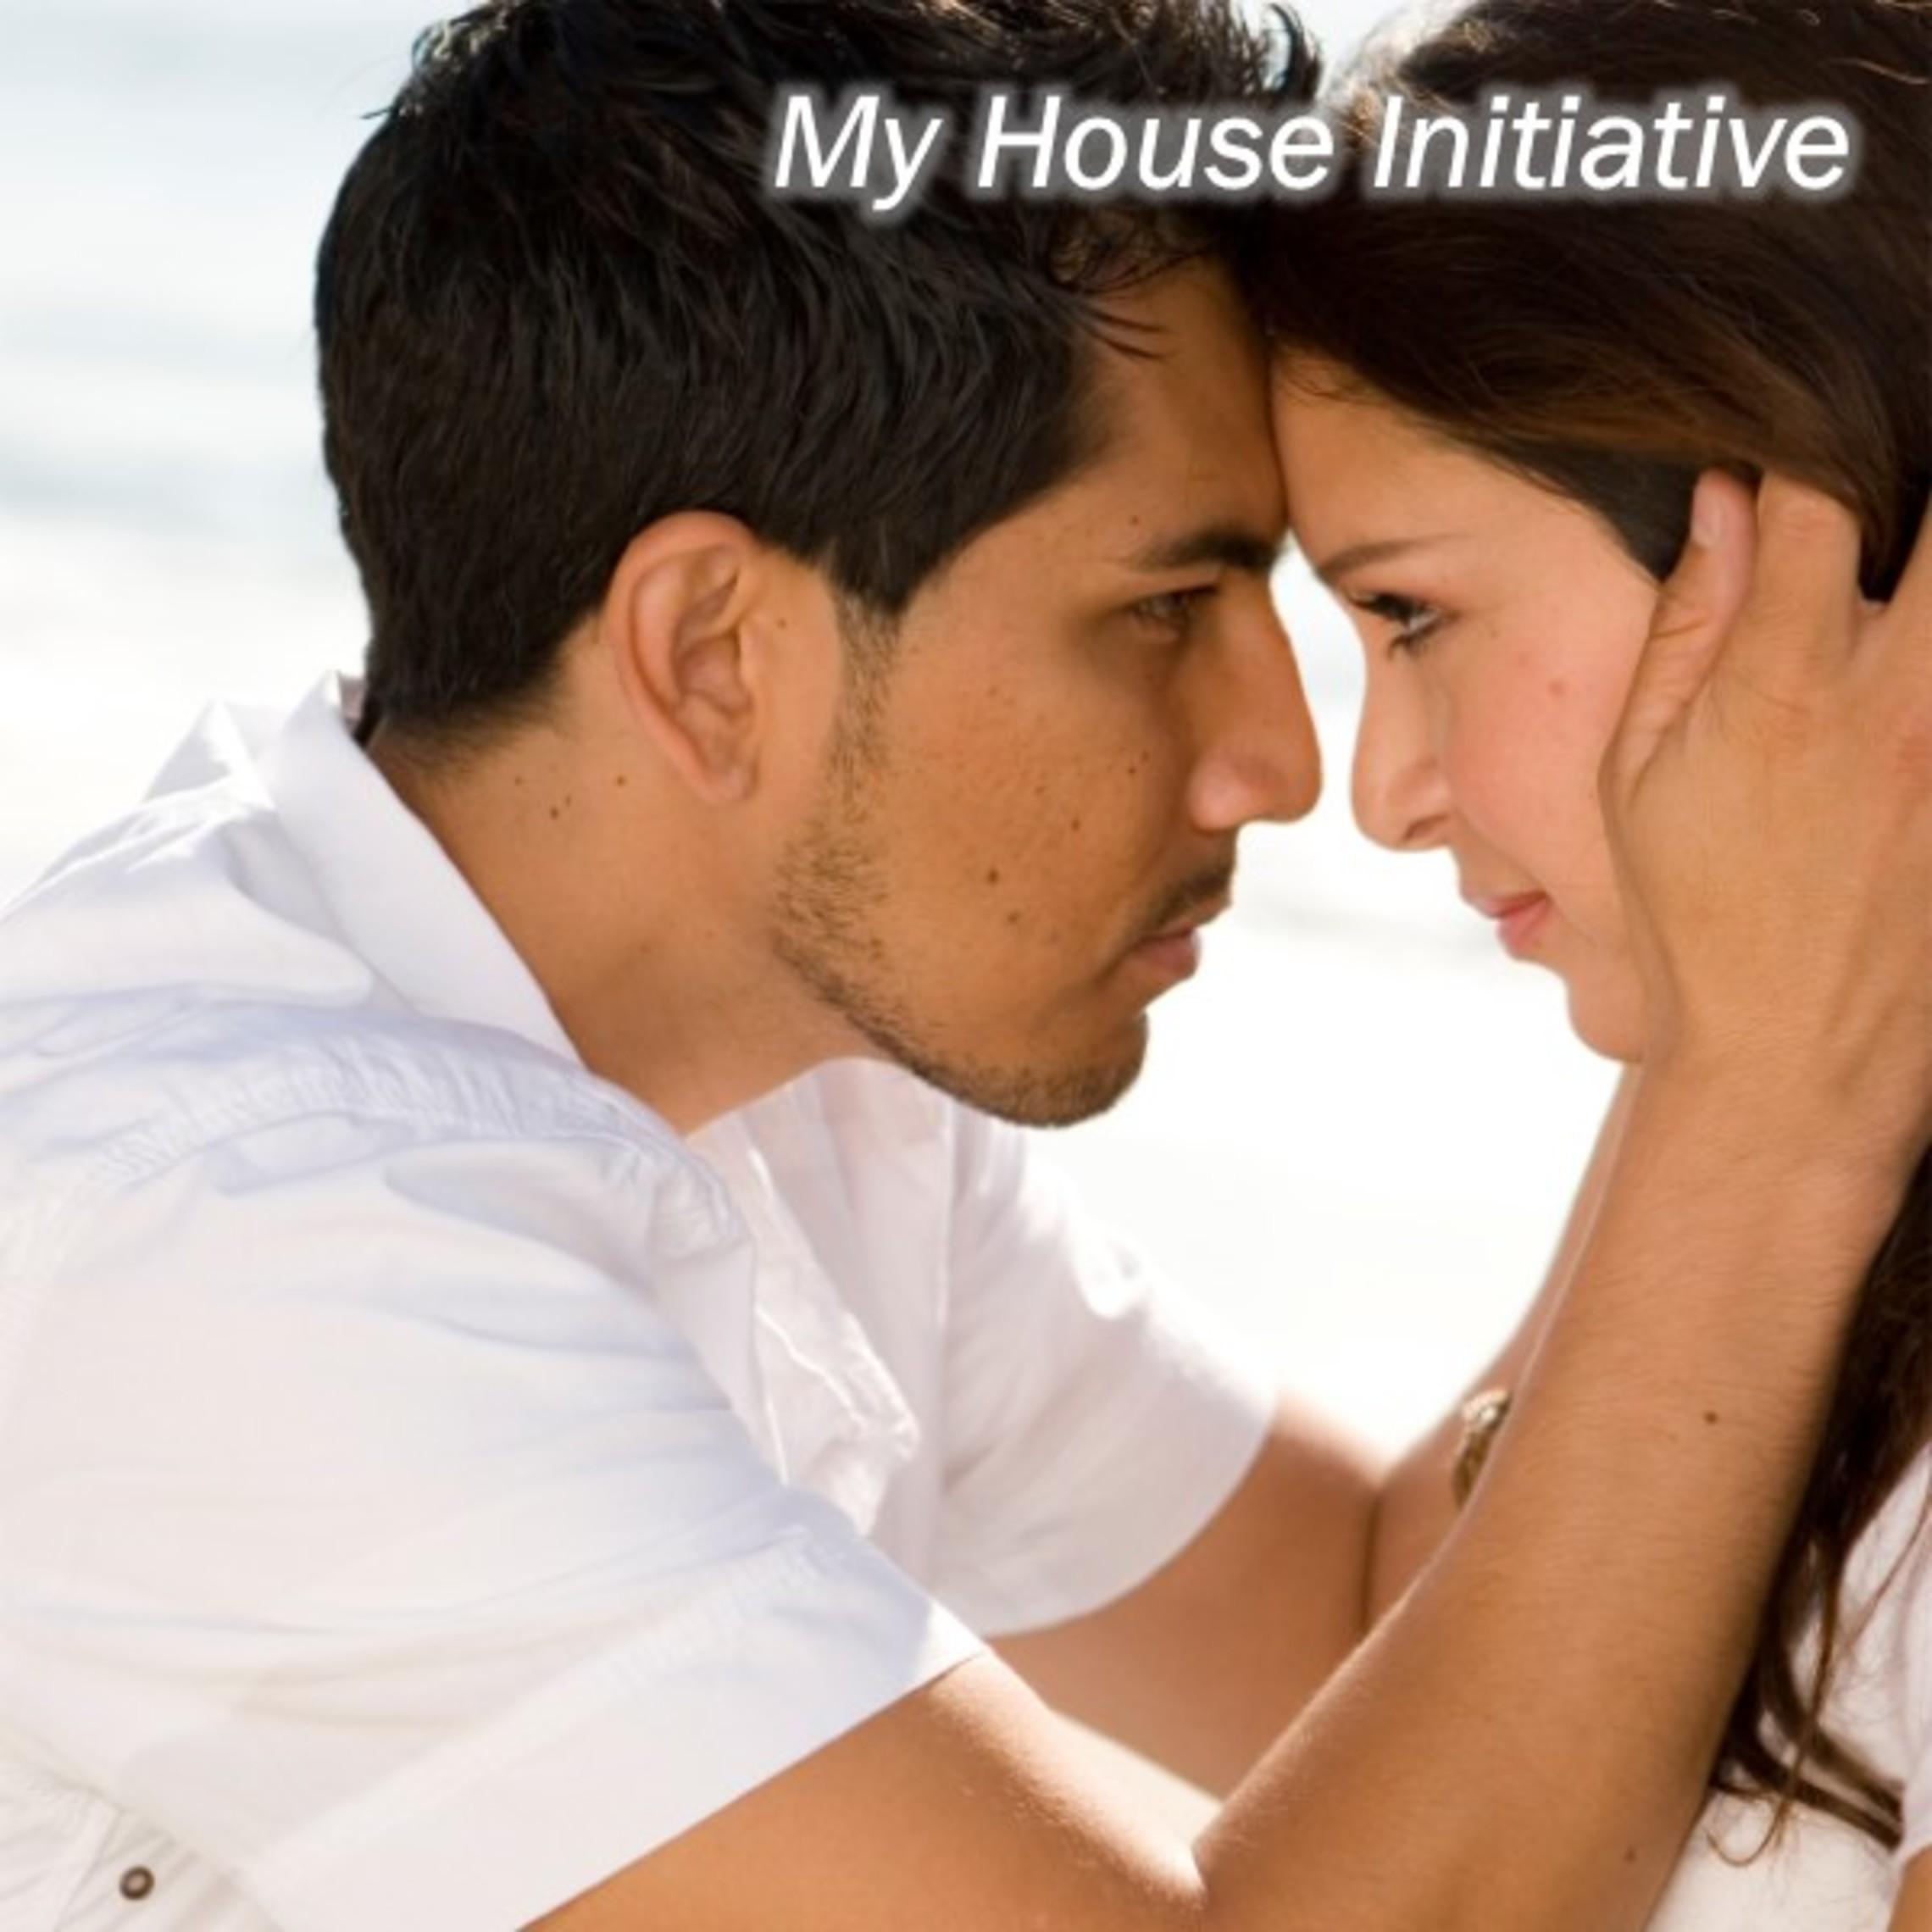 My House Initiative